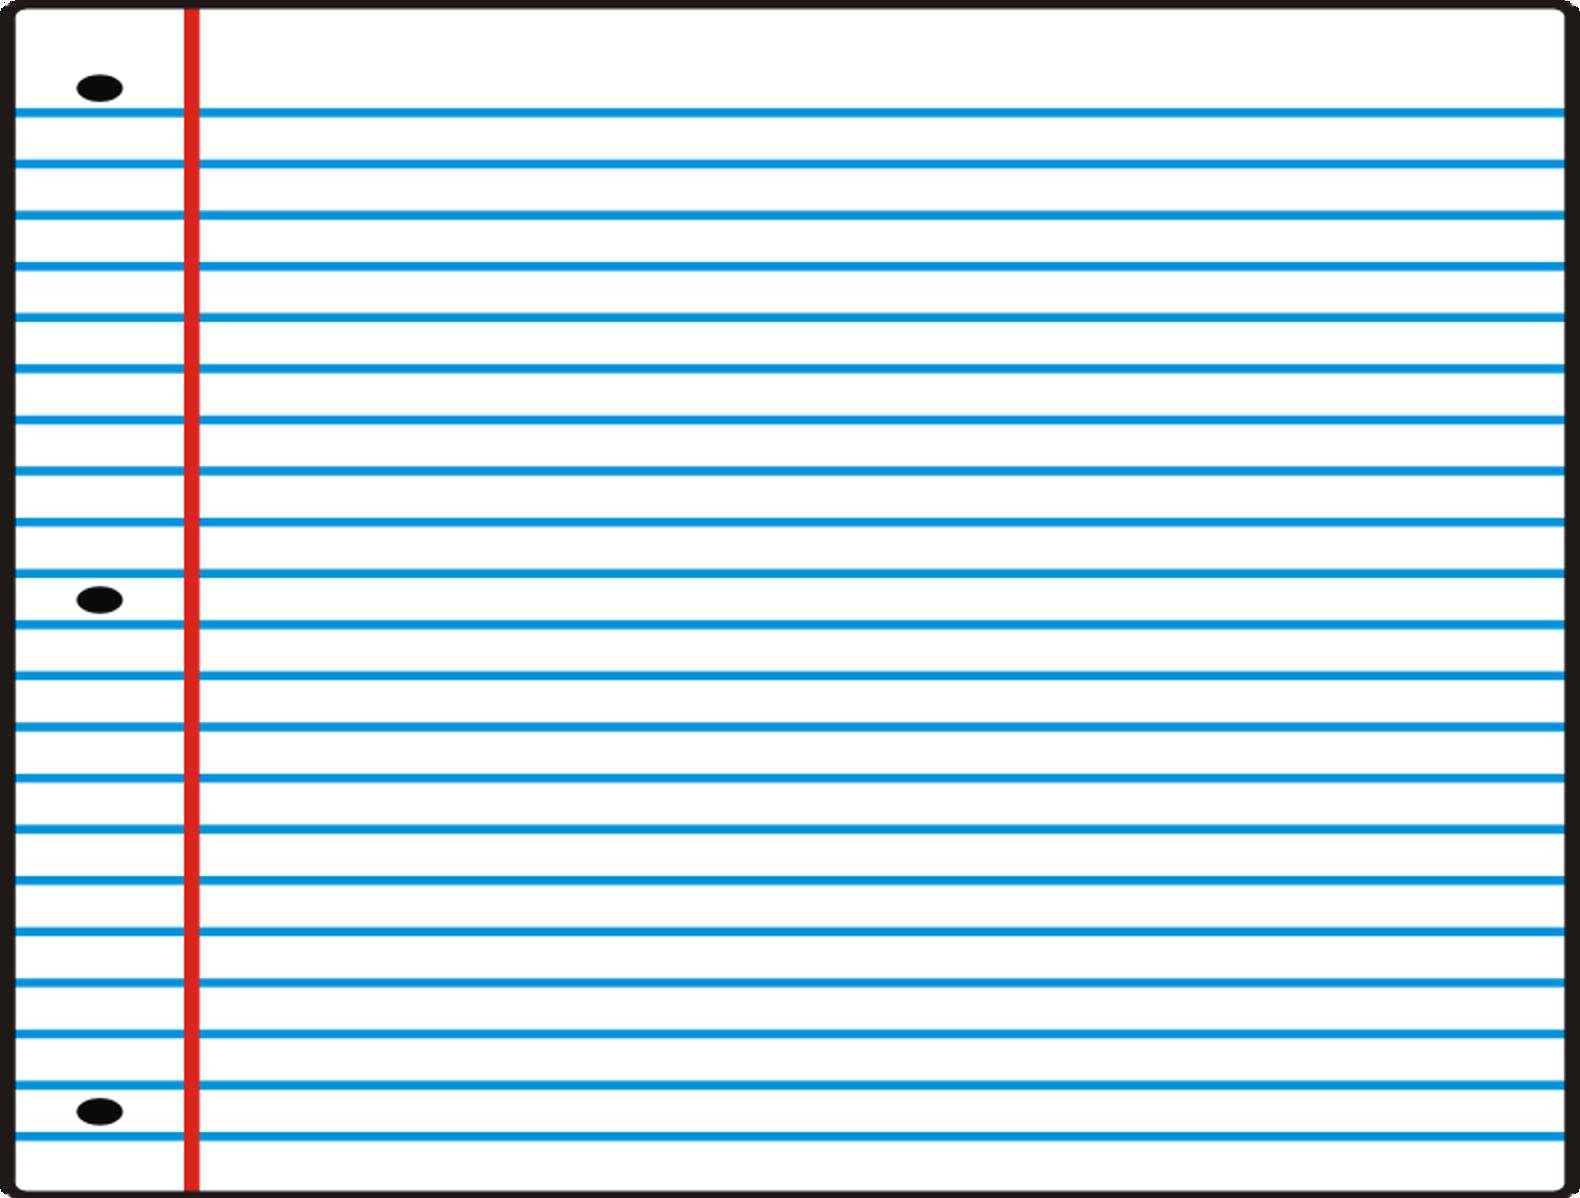 Piece Of Notebook Paper Clipart - ClipArt Best - ClipArt Best